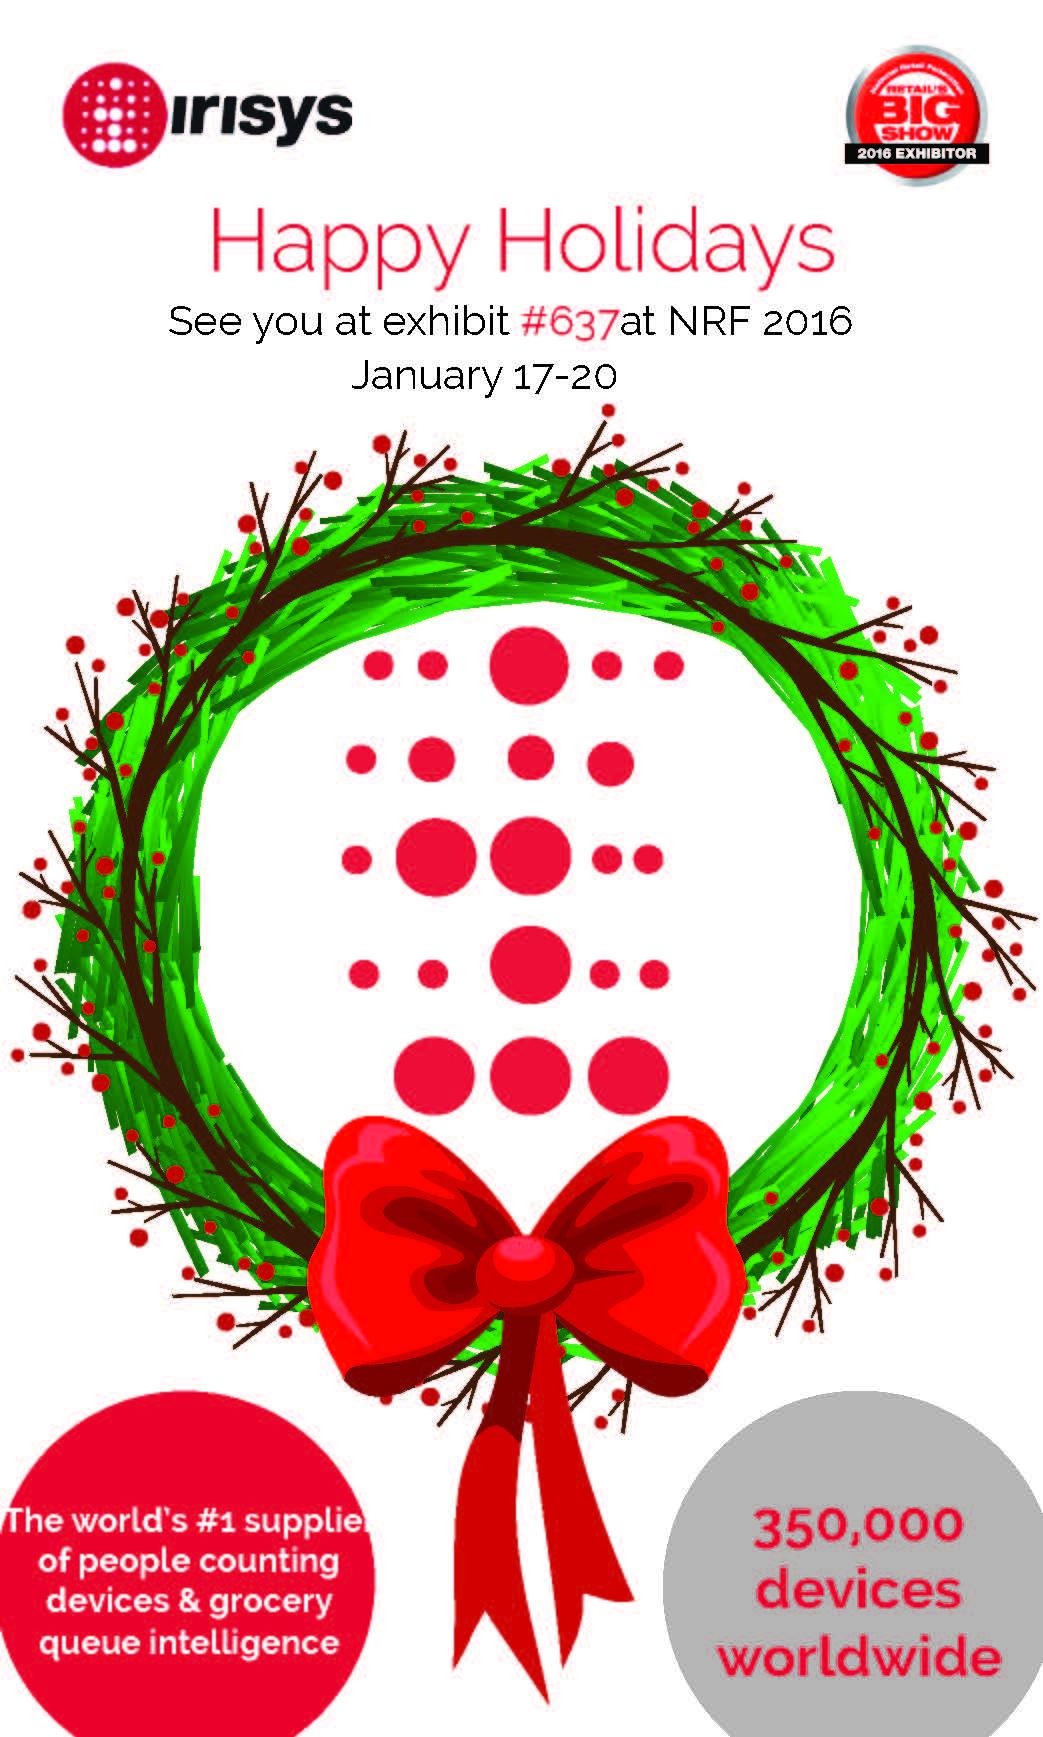 Happy_Holidays_v2_D1_-_12.14.2015_Page_1.jpg